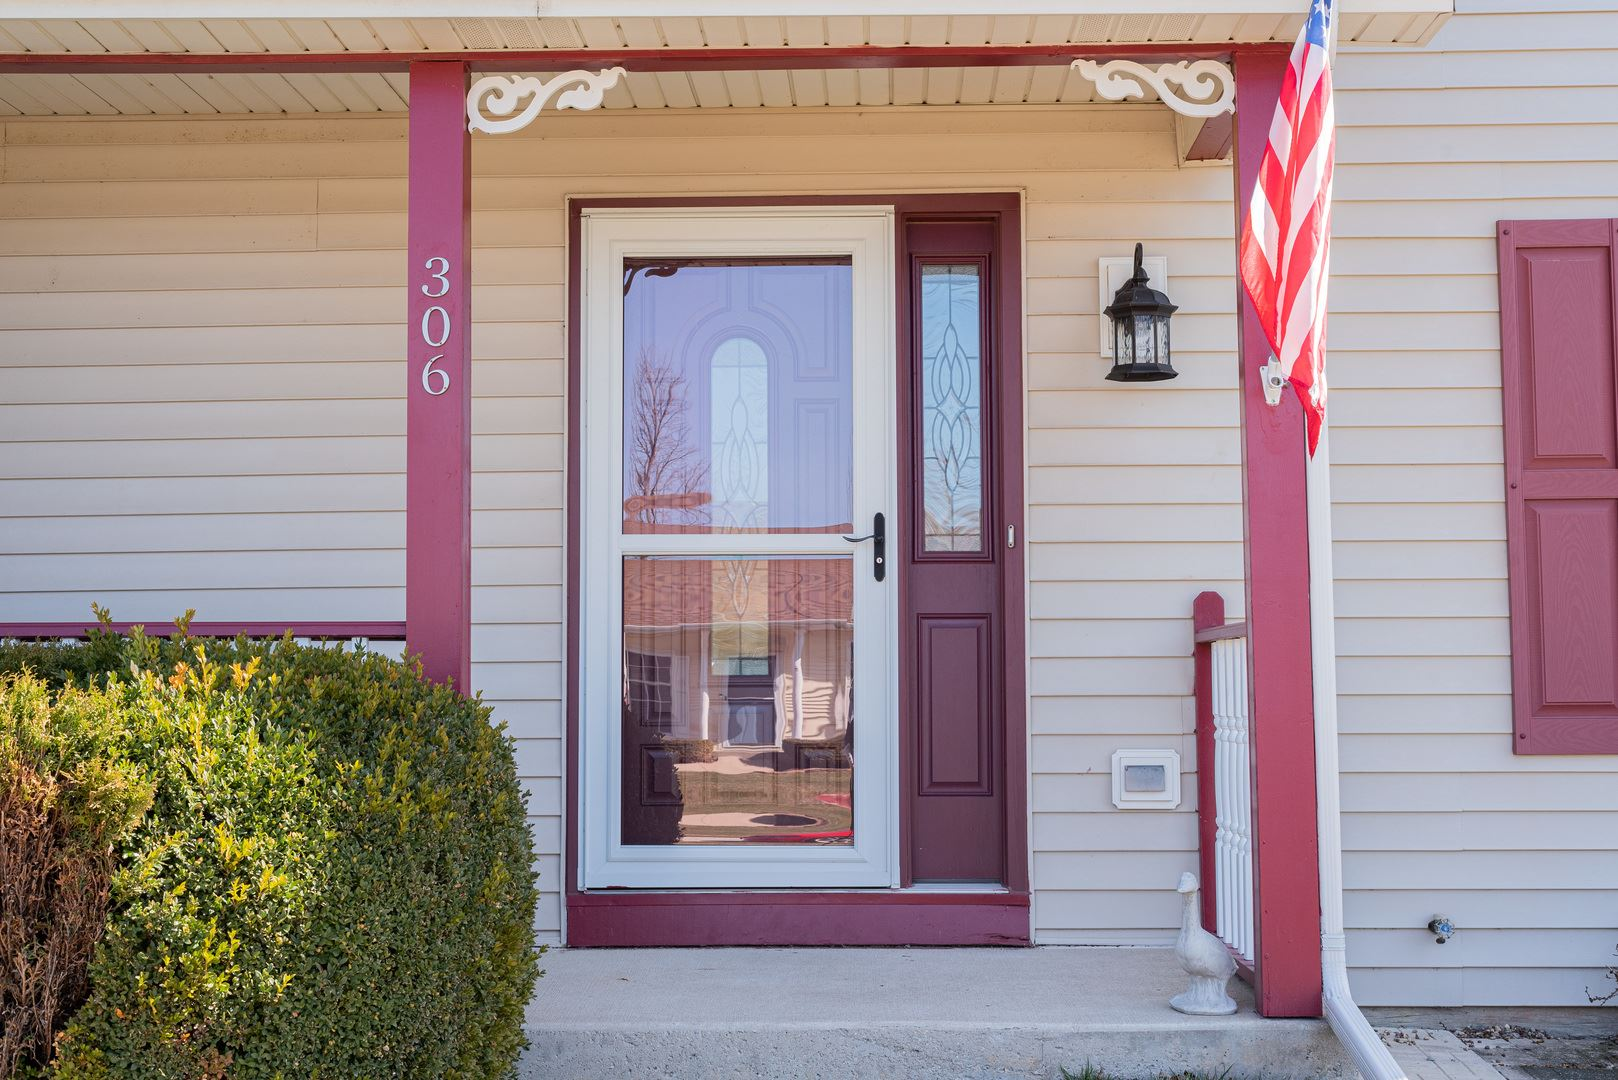 Photo of 306 Glen Mor Drive, Shorewood, IL 60404 (MLS # 11027107)